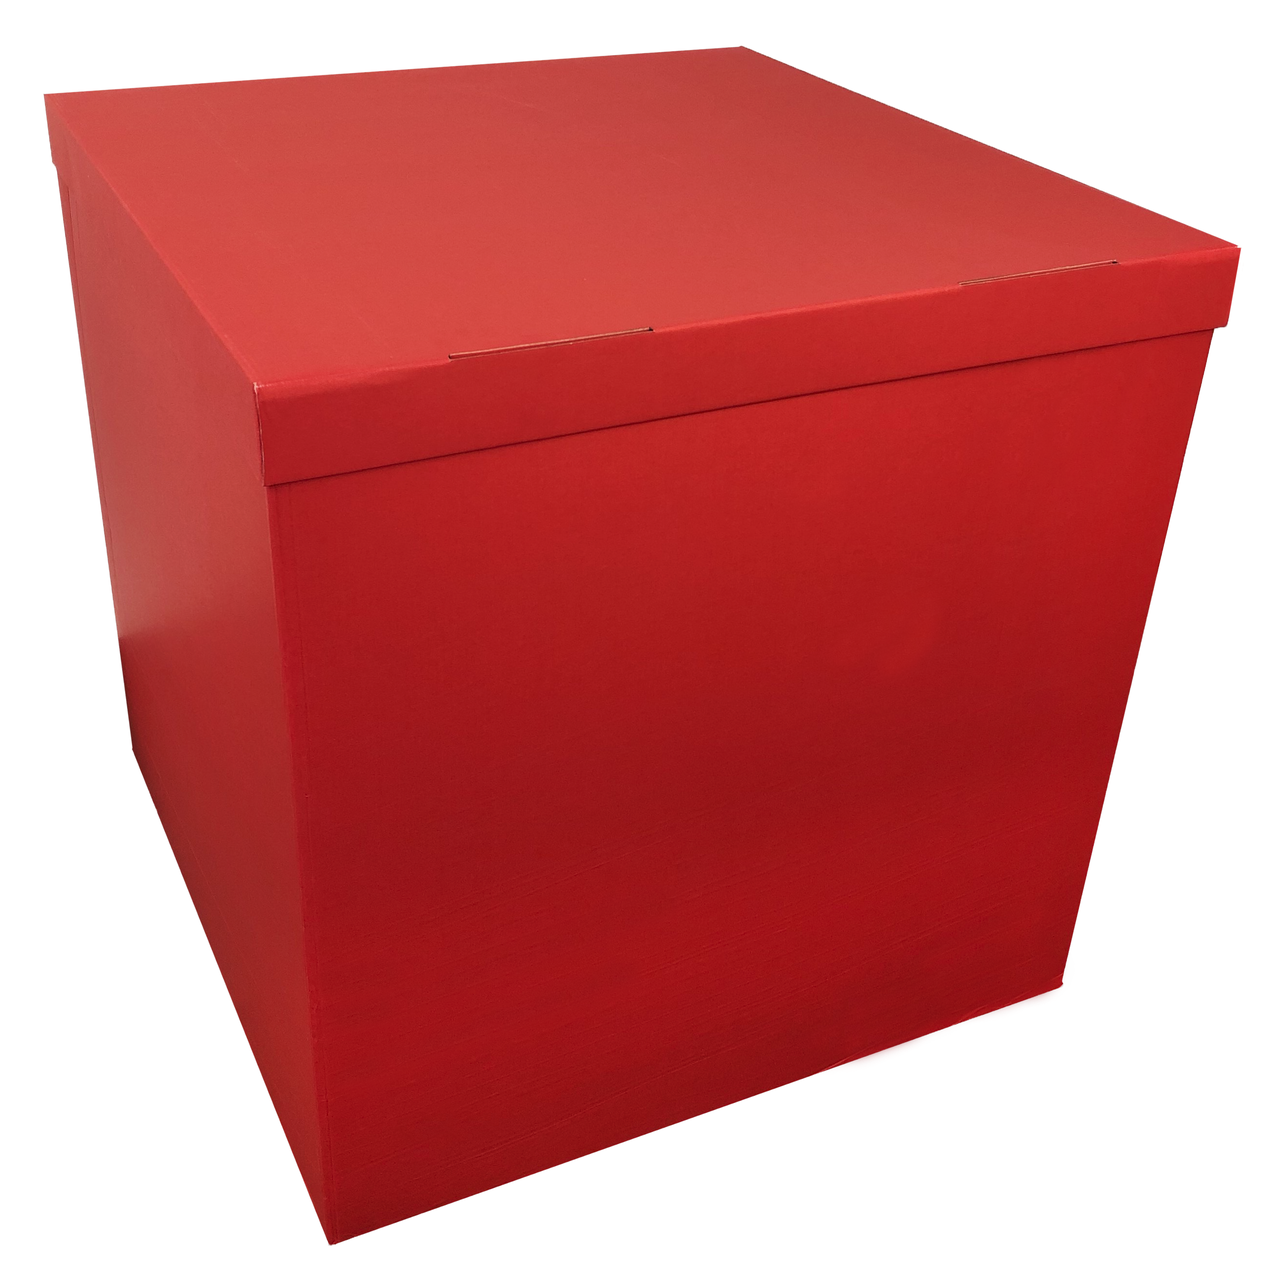 Коробка-сюрприз 70*70*70см двухсторонняя красная, 1 шт